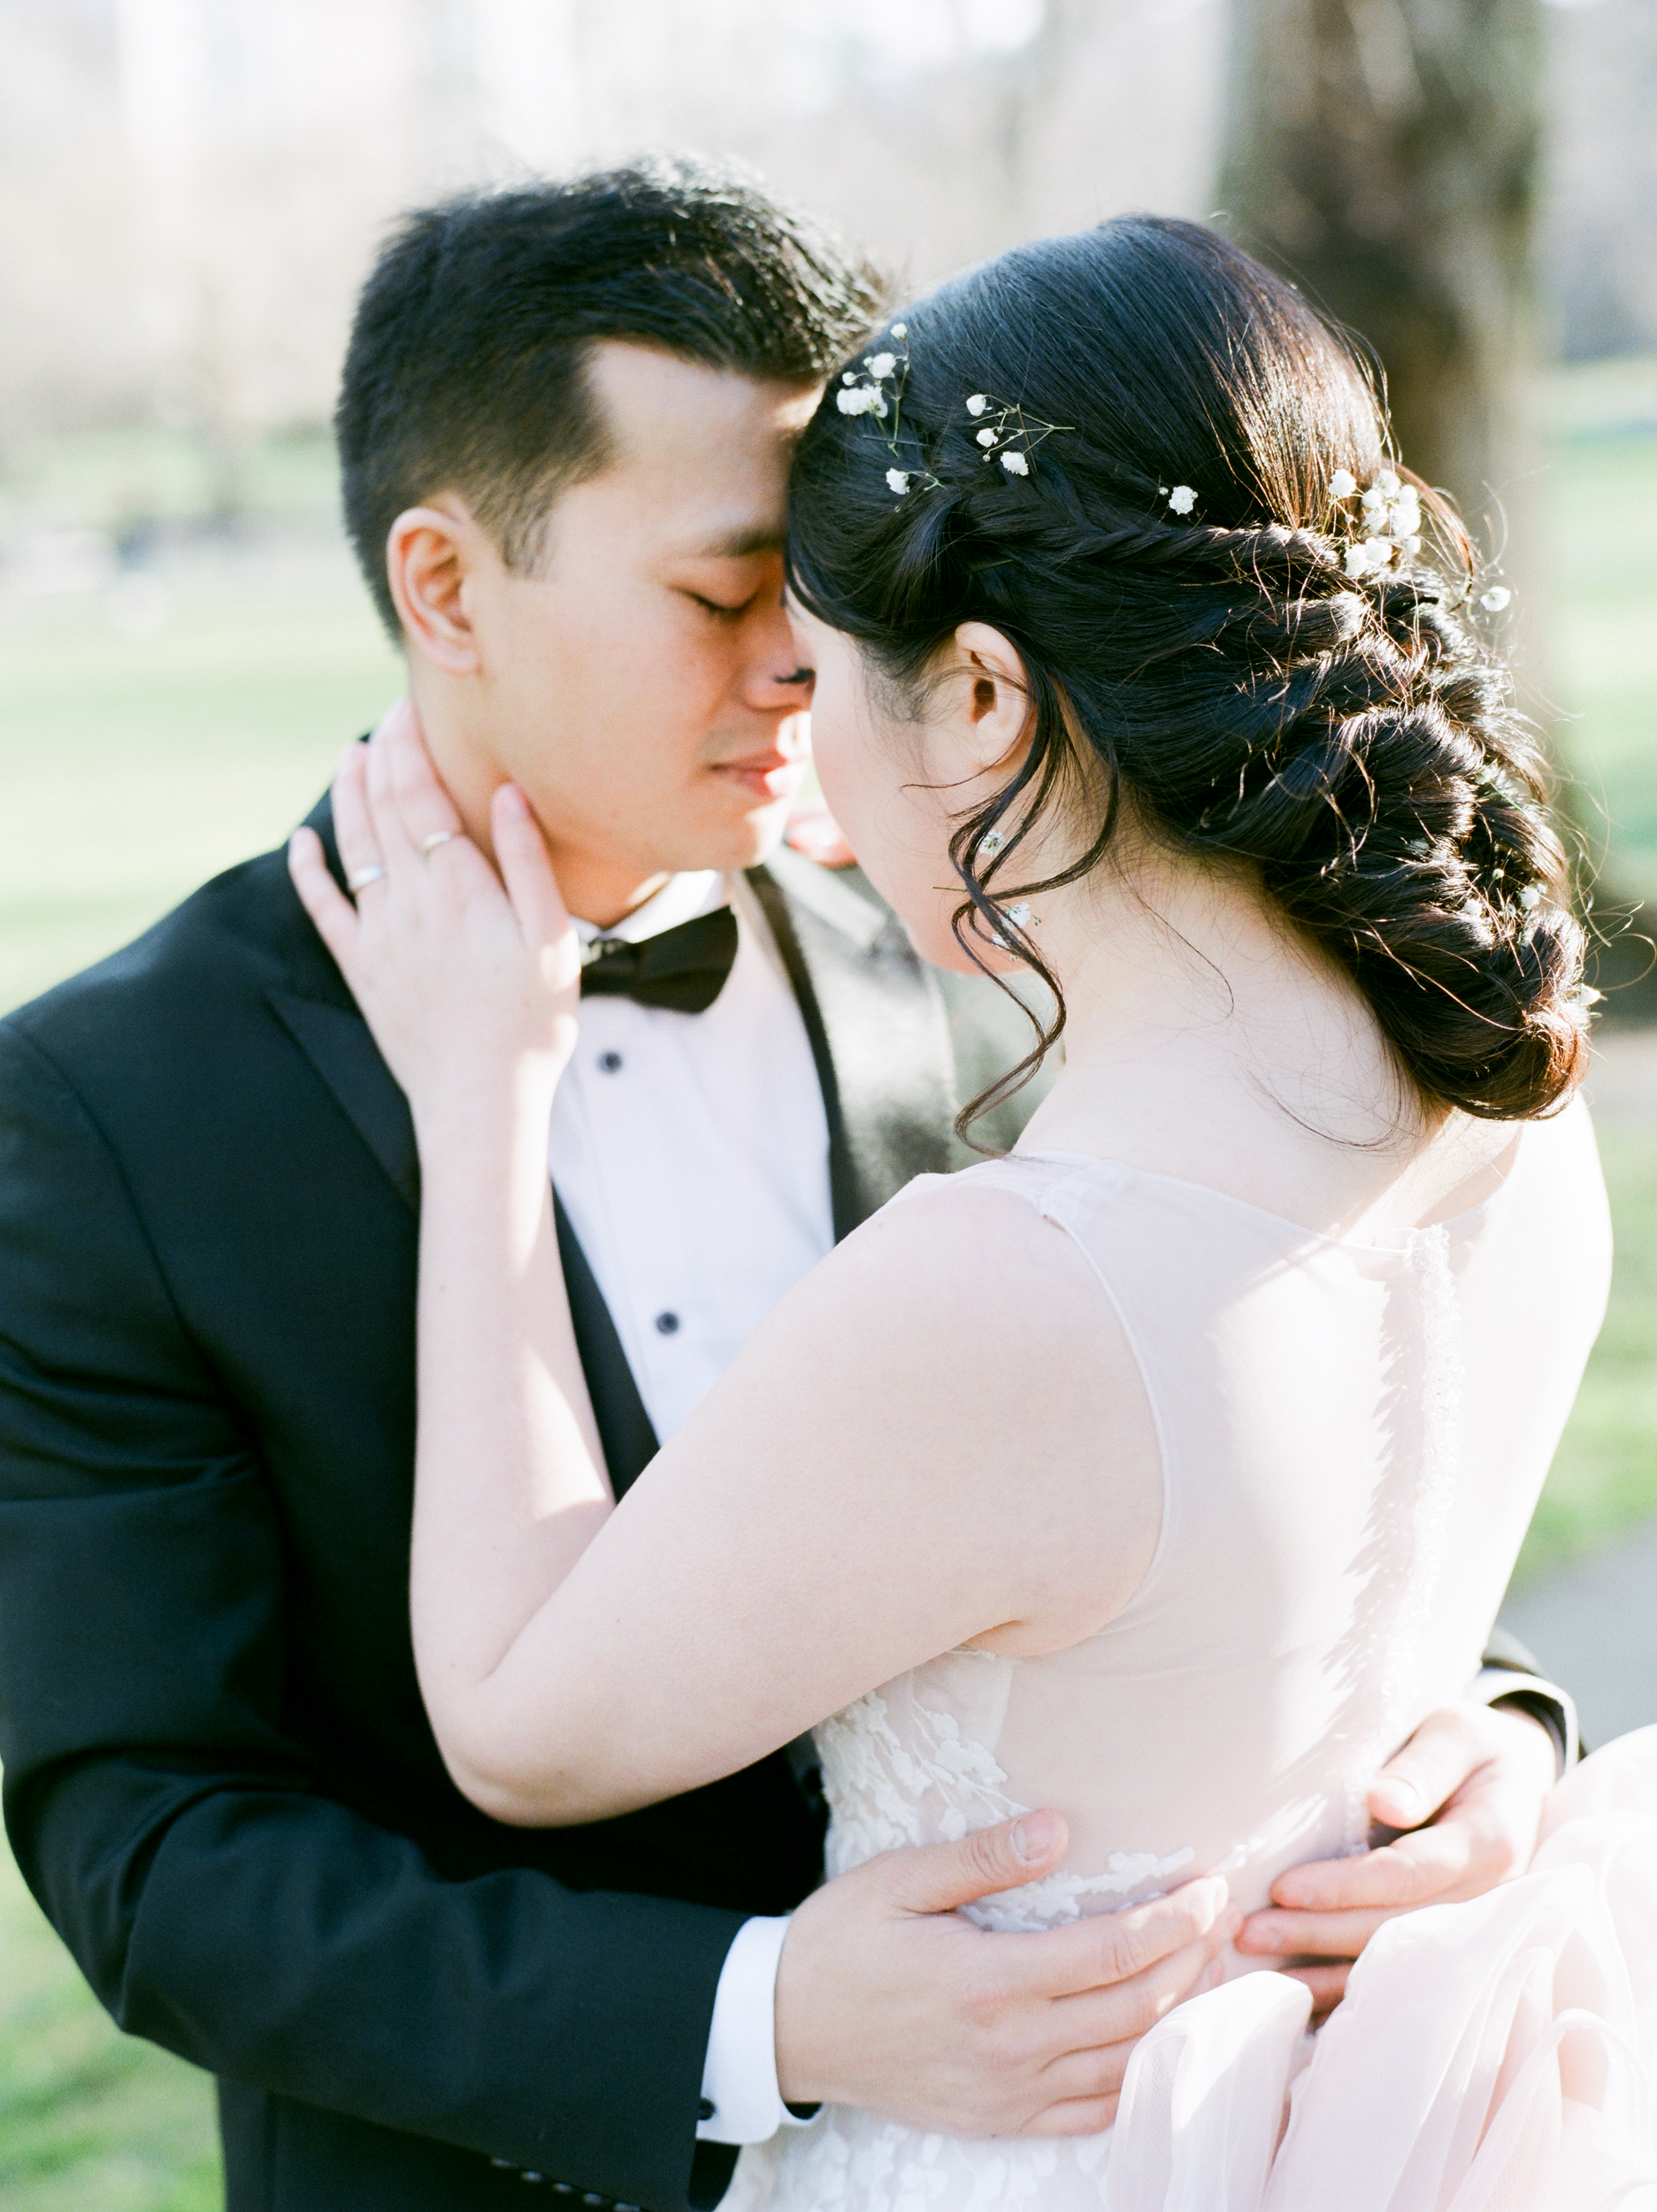 Destination Wedding Photographer in MA